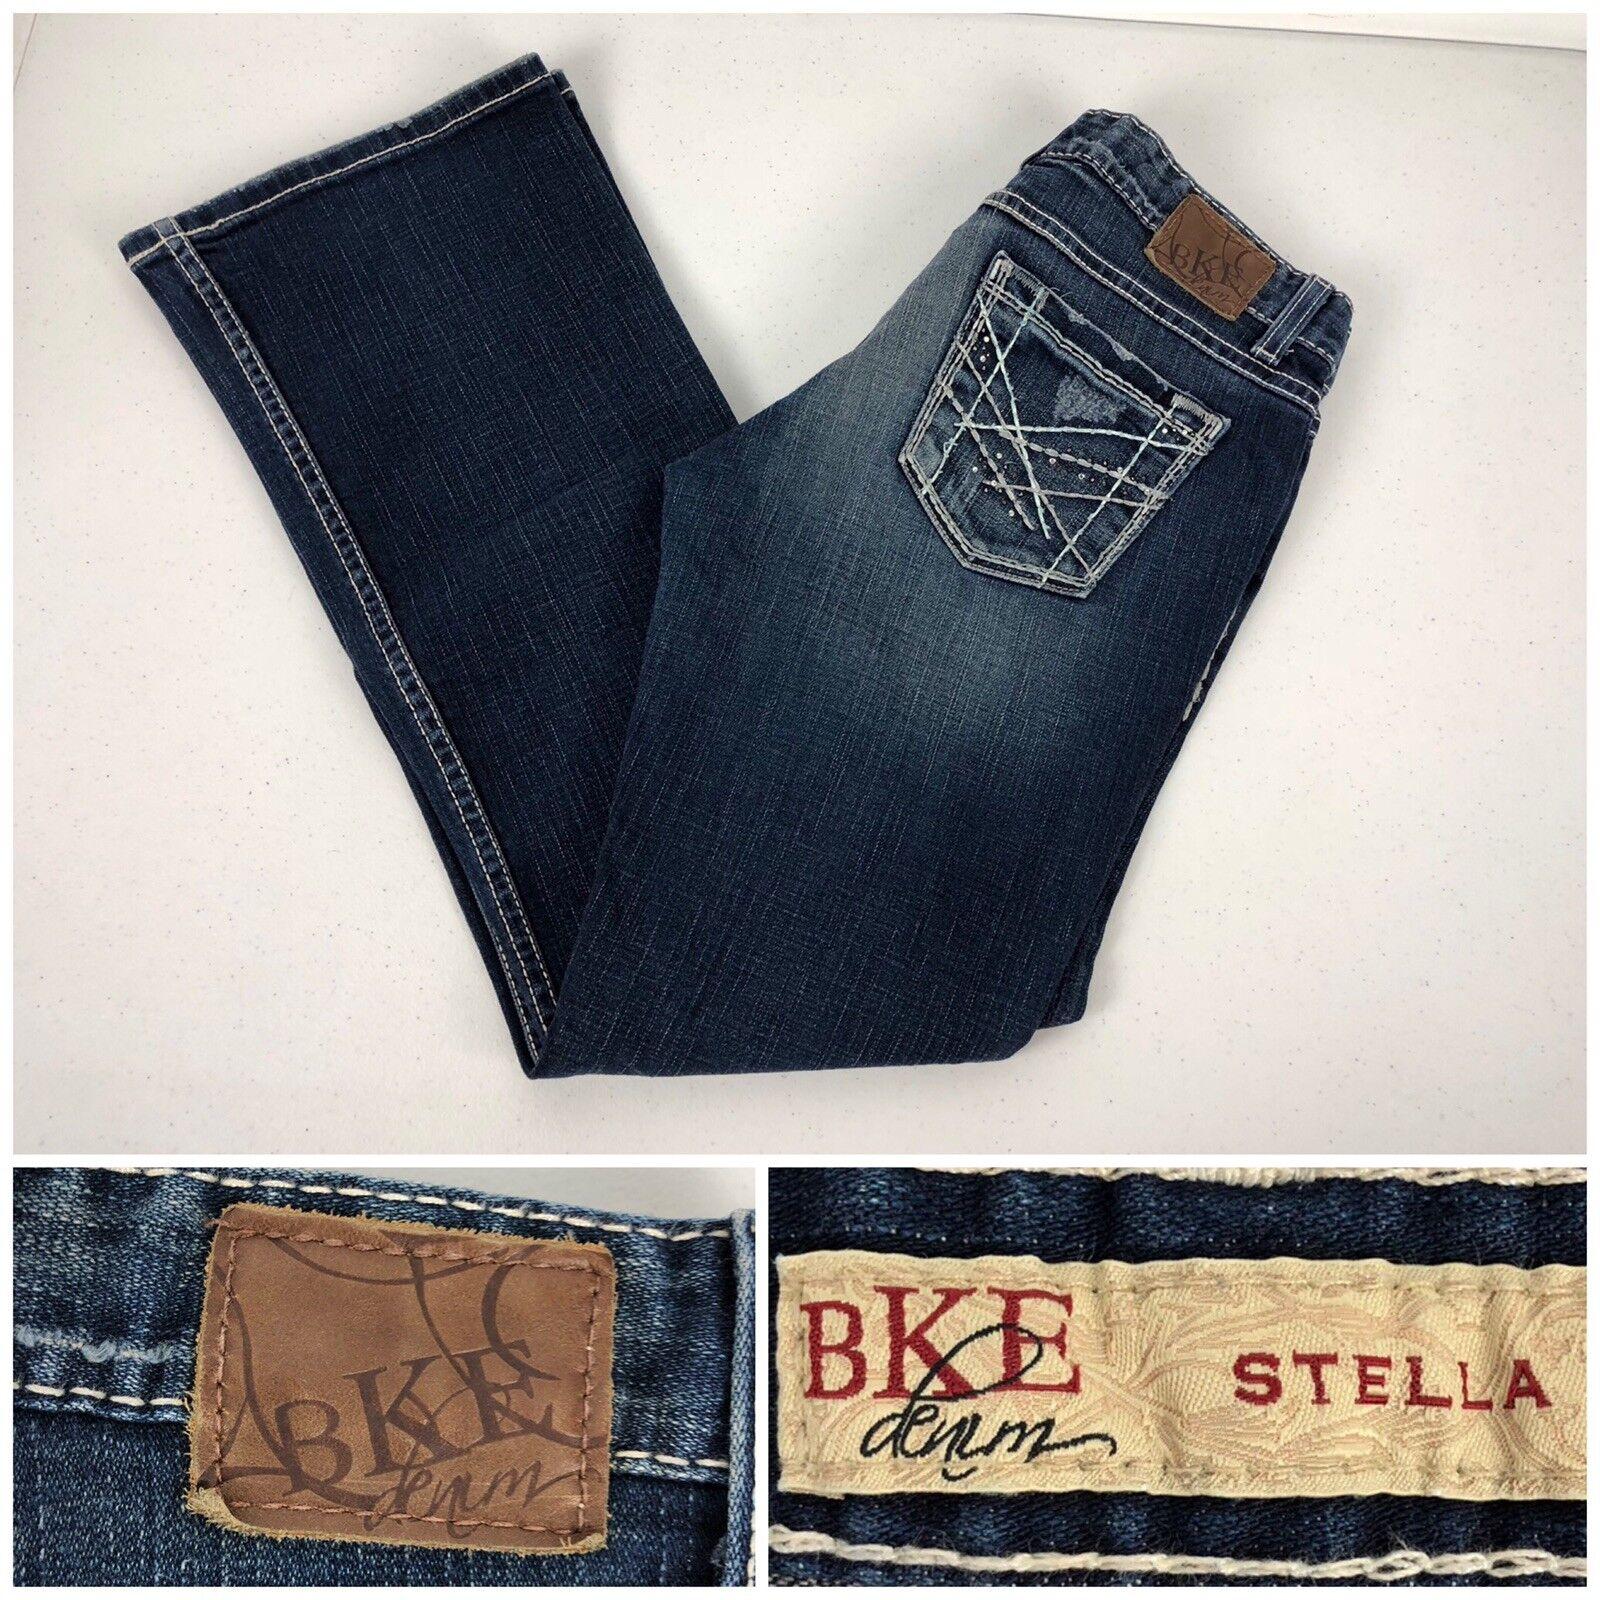 BKE Stella Womens 28 X 29 1 2 Jeans Denim Cotton Spandex Distressed